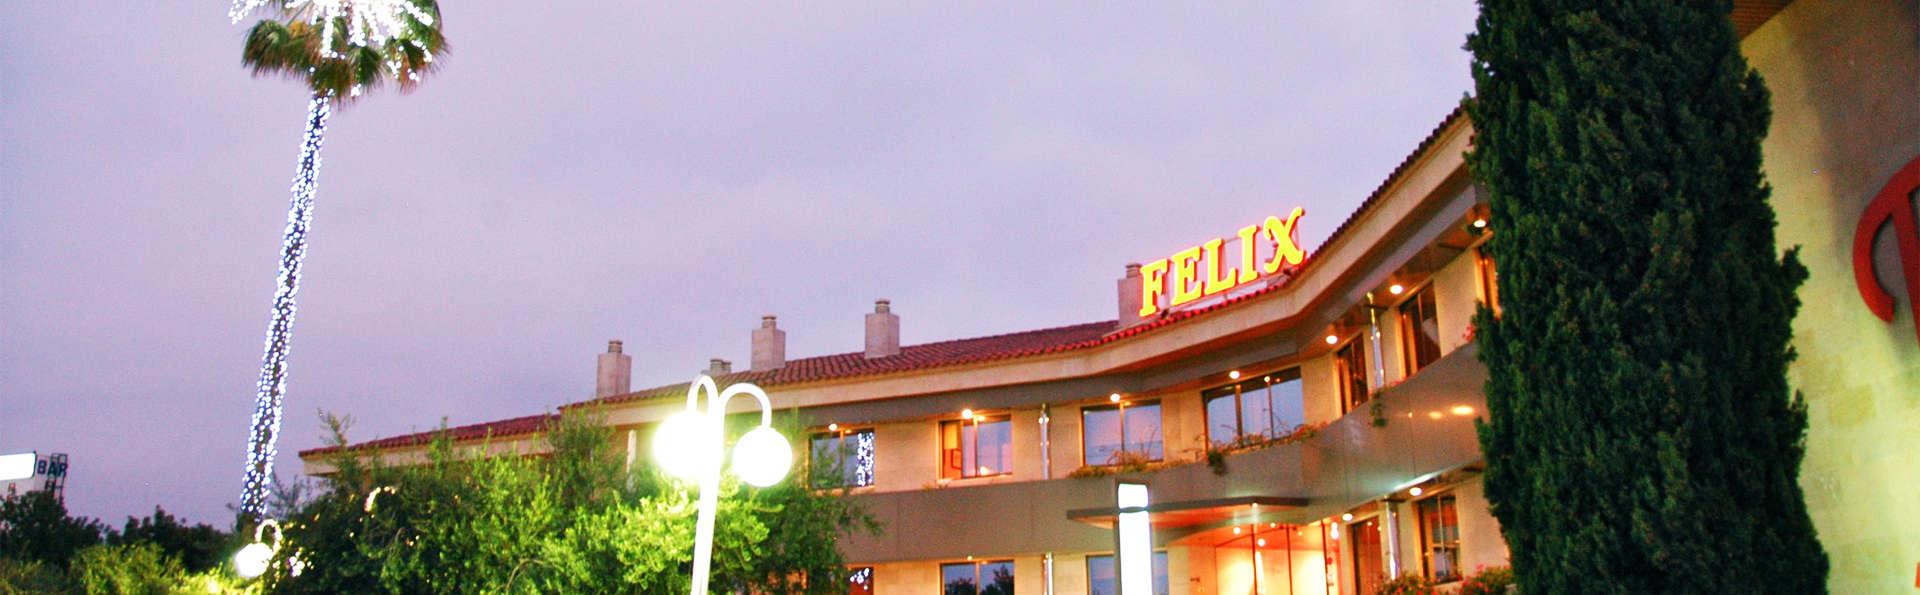 Hotel Felix - EDIT_front2.jpg